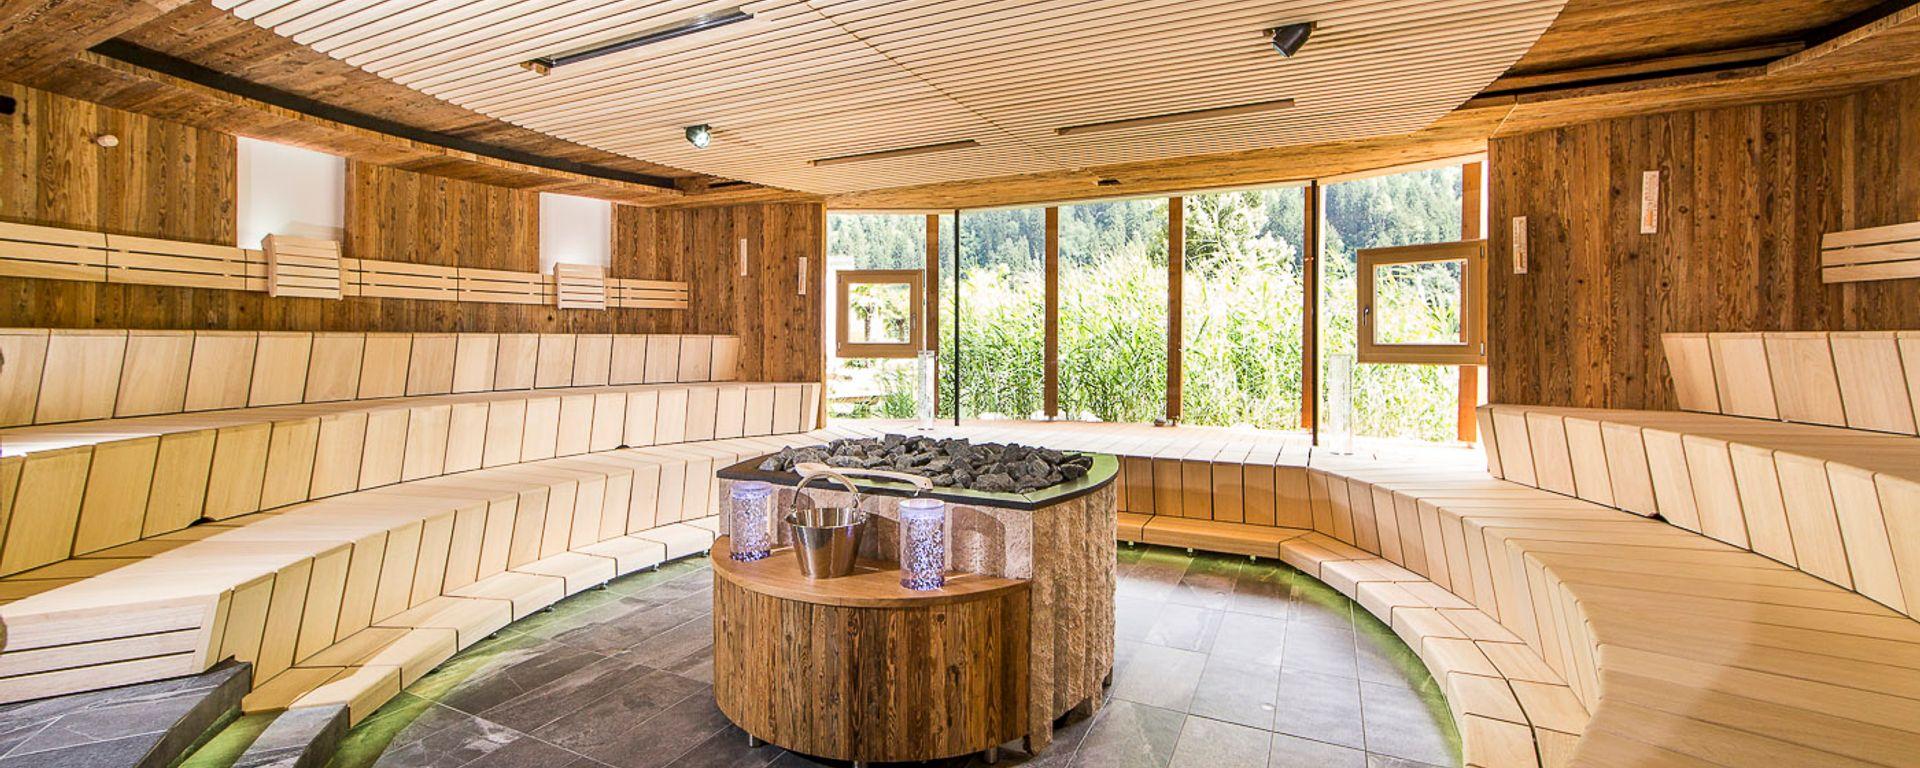 See-Event-Sauna.jpg